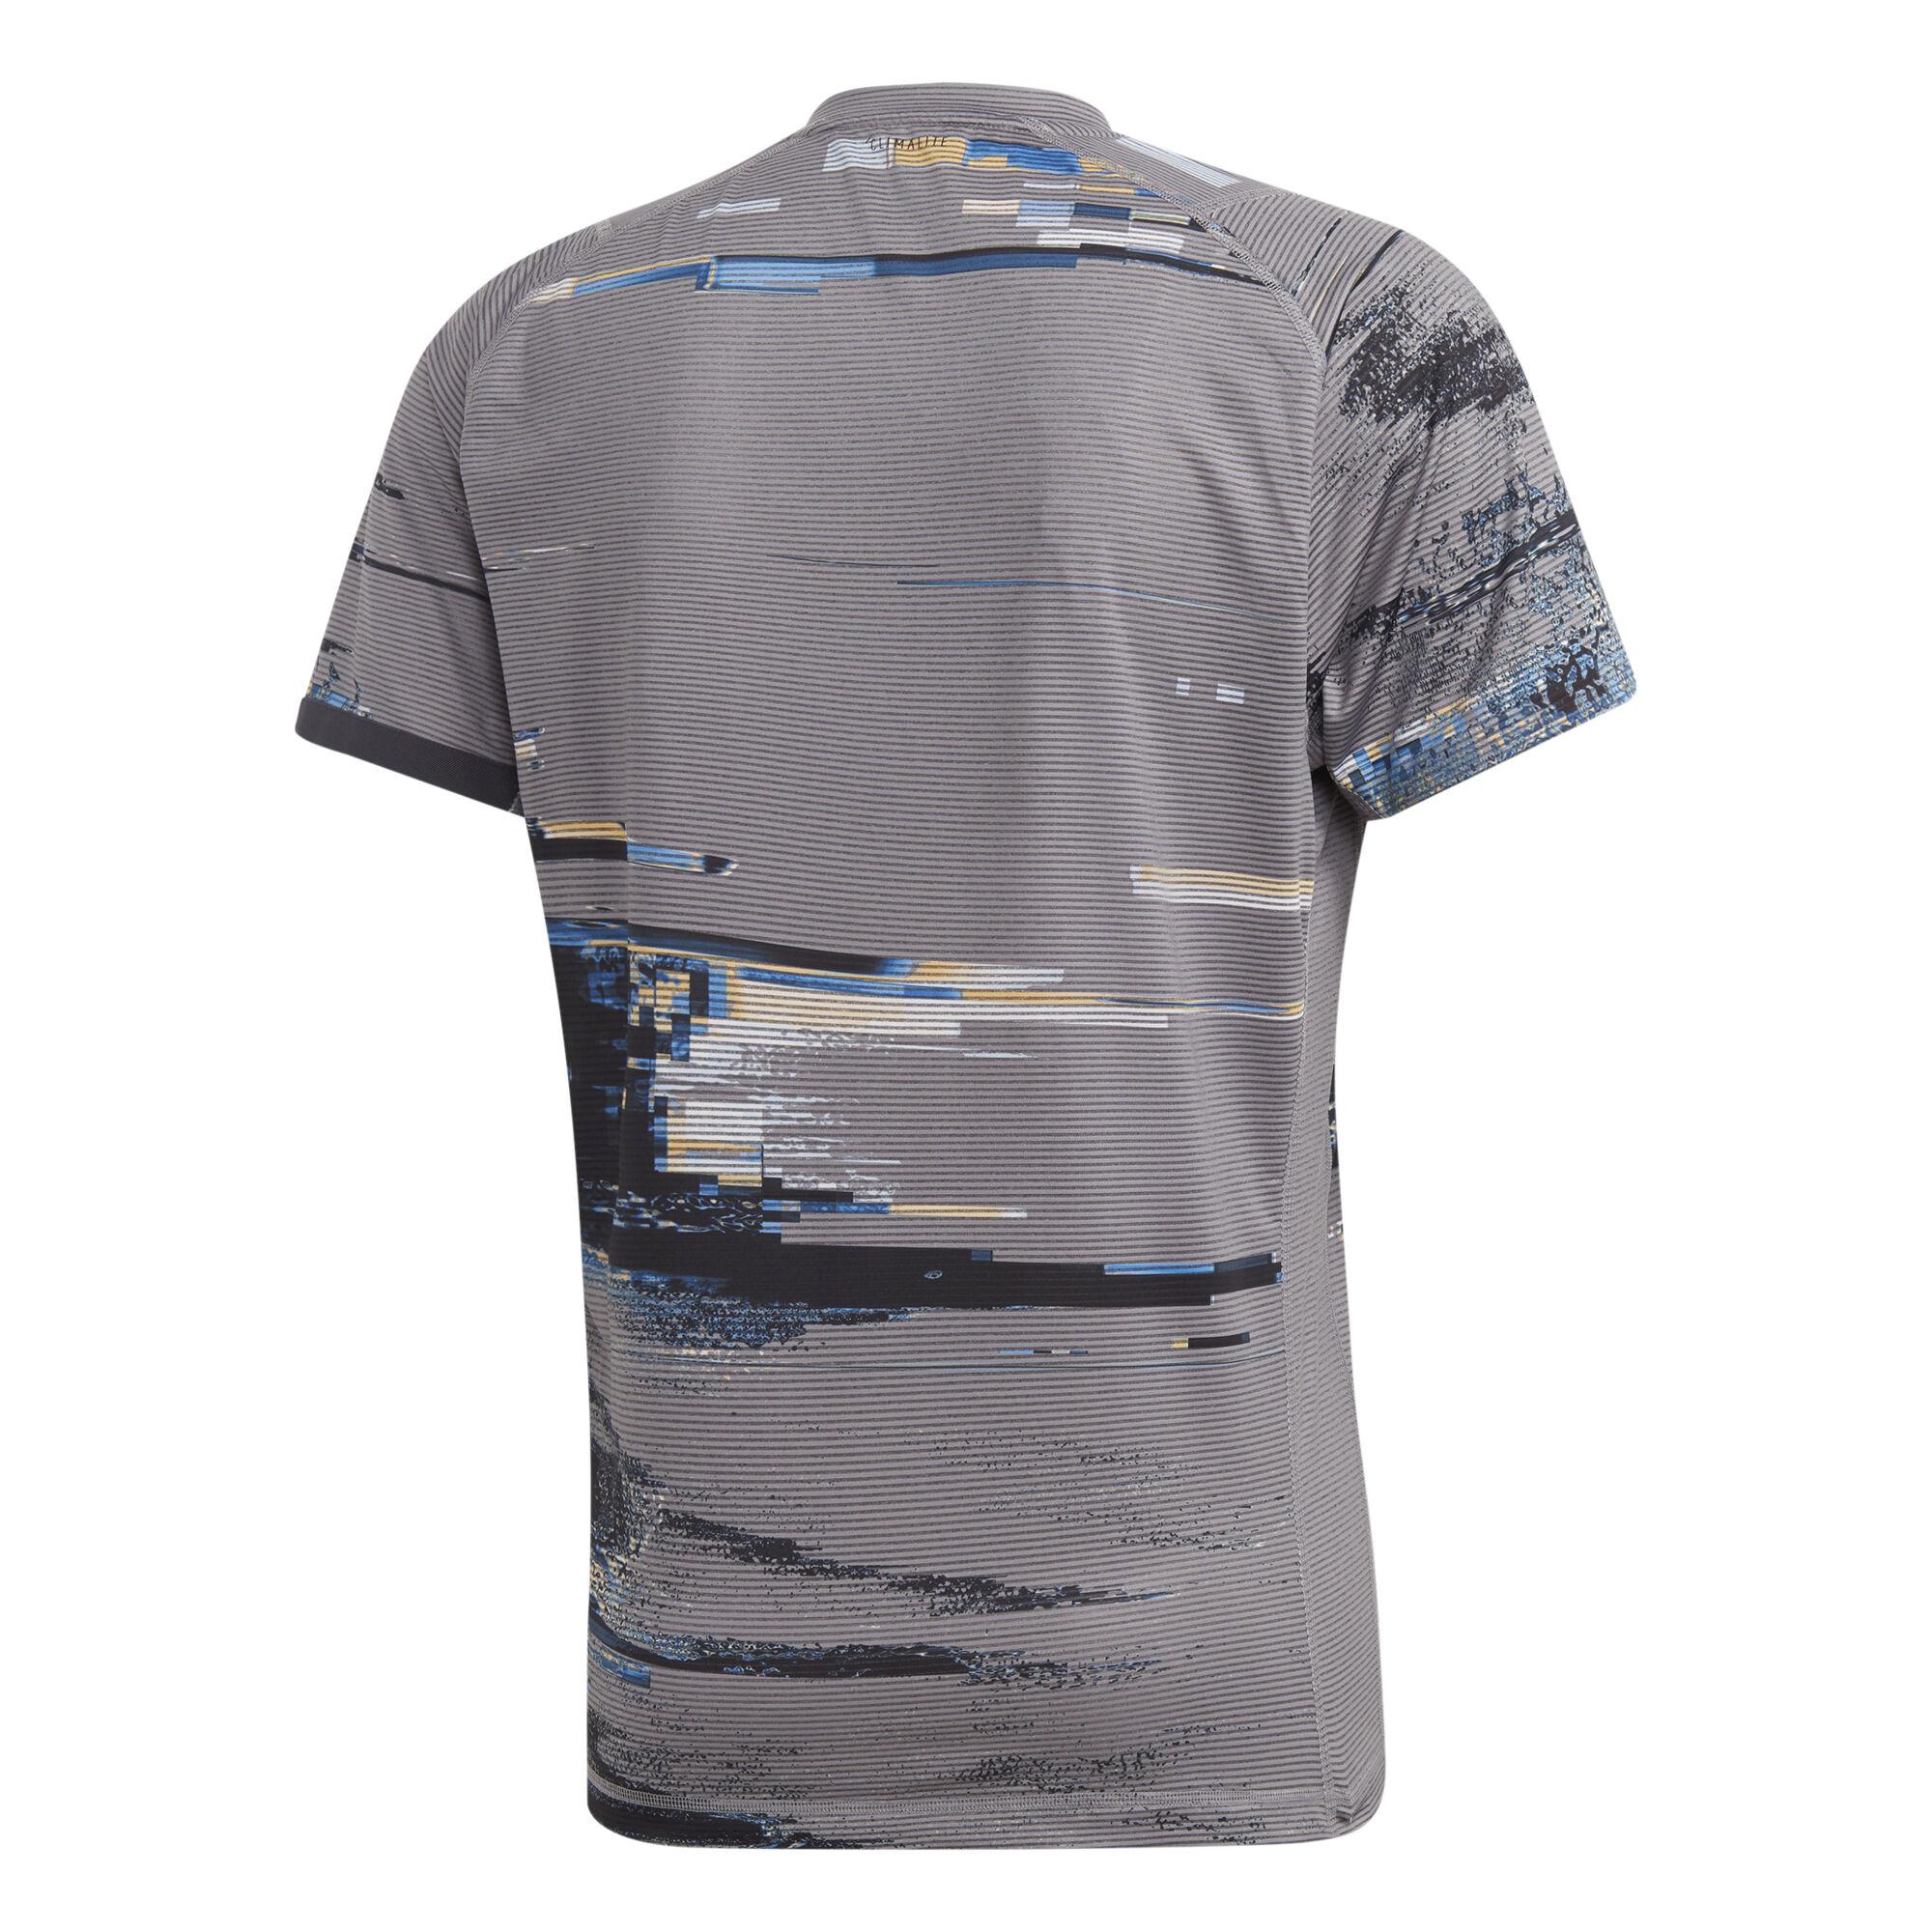 adidas New York Printed T shirt Hommes Gris , Noir acheter